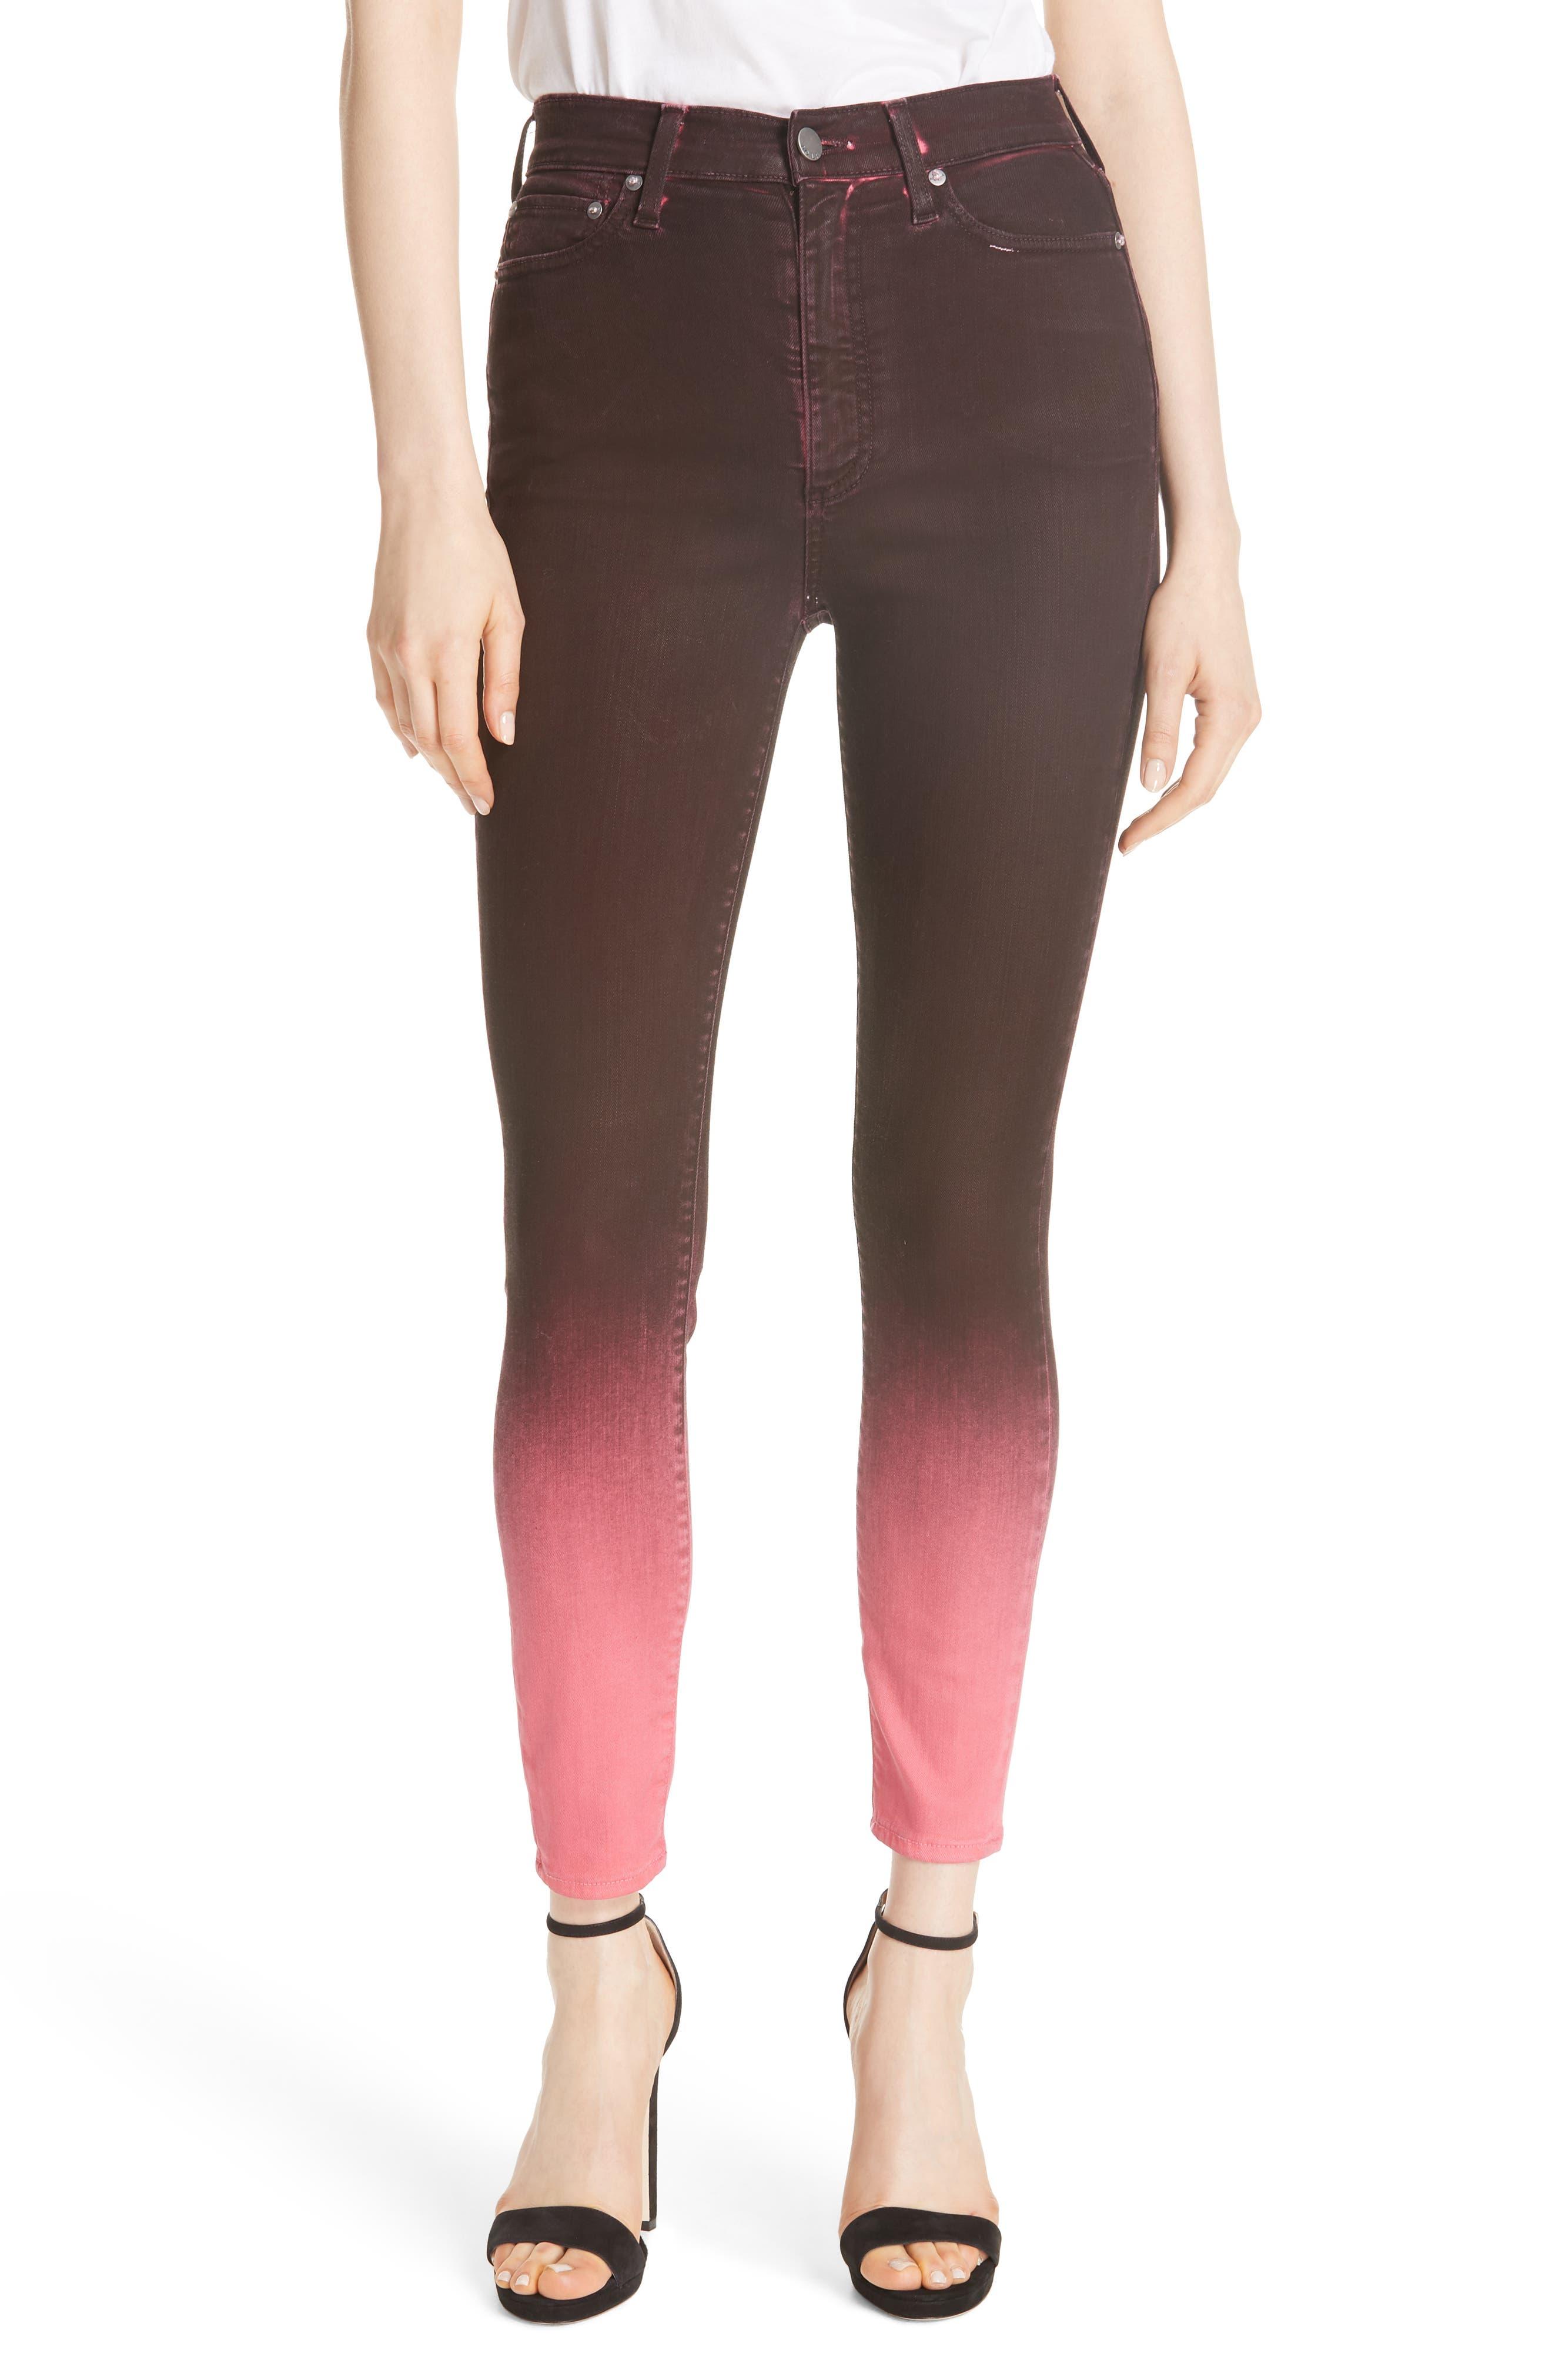 AO.LA Good High Waist Ankle Skinny Jeans,                         Main,                         color, WINE/ BUBBLEGUM